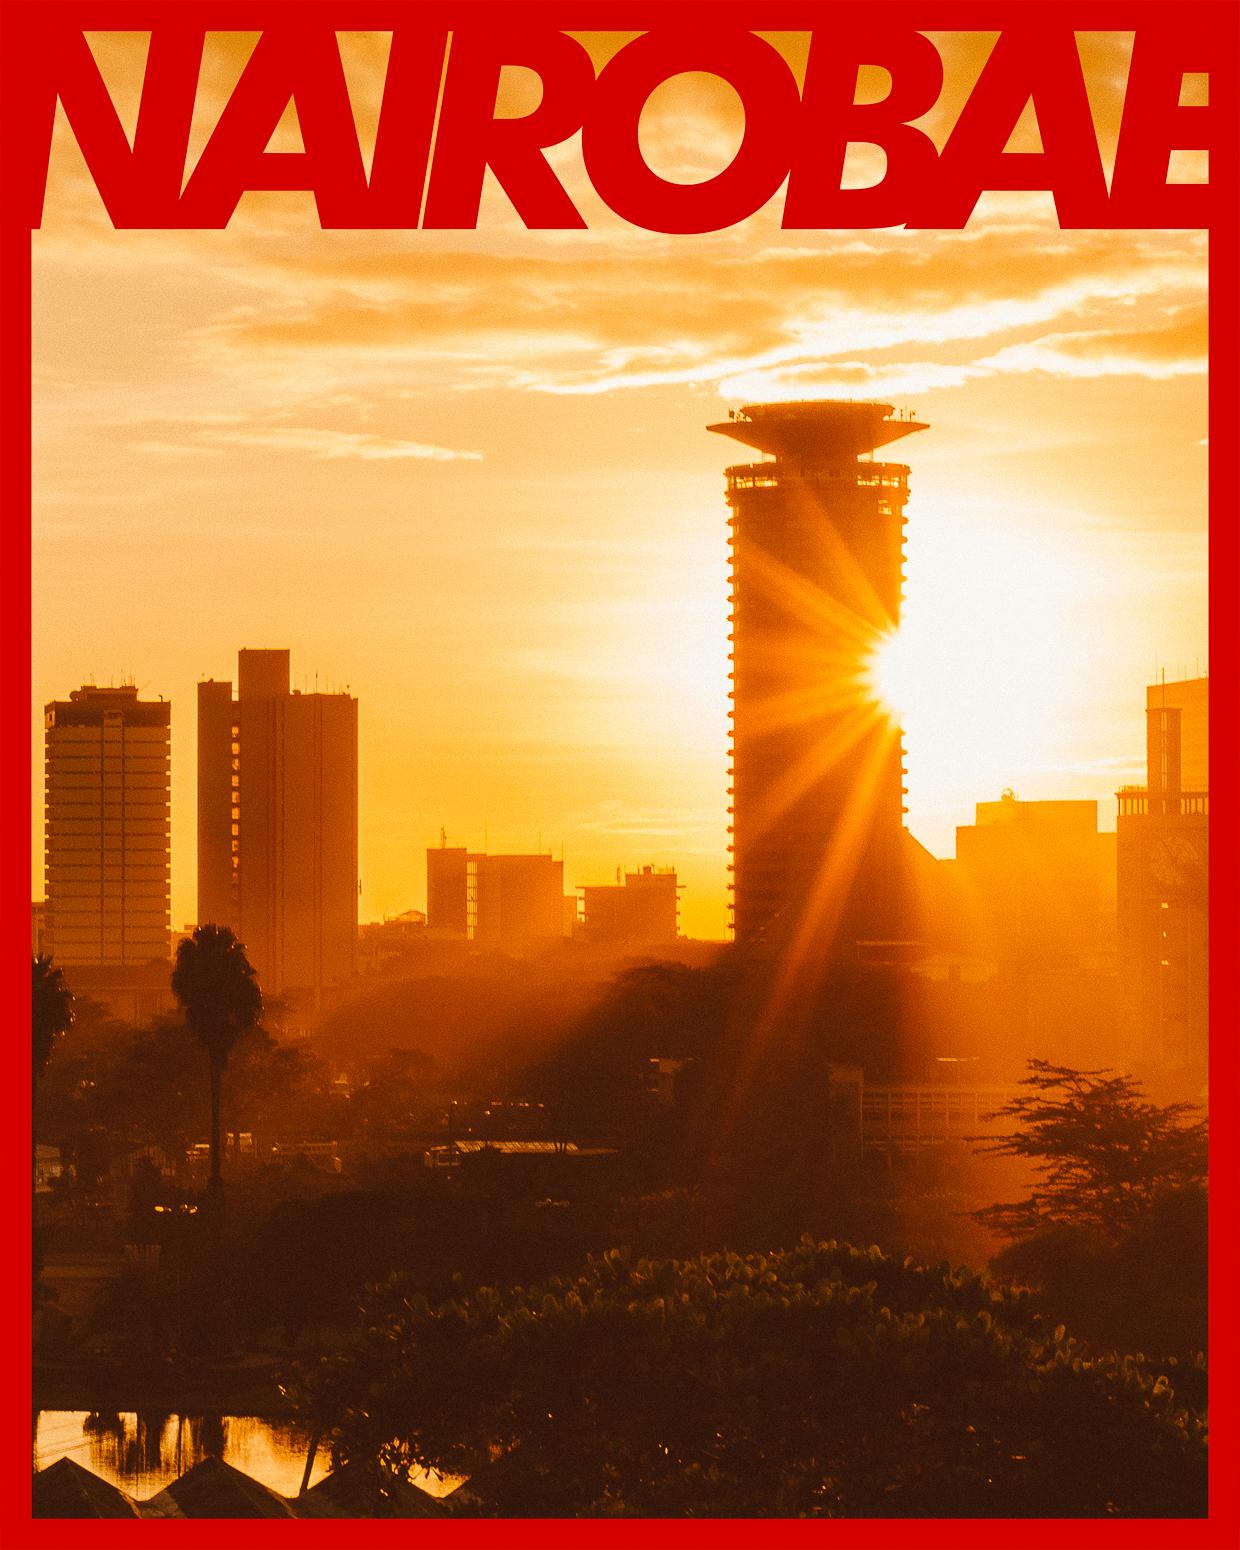 T_04_NAIROBAE FLAMES